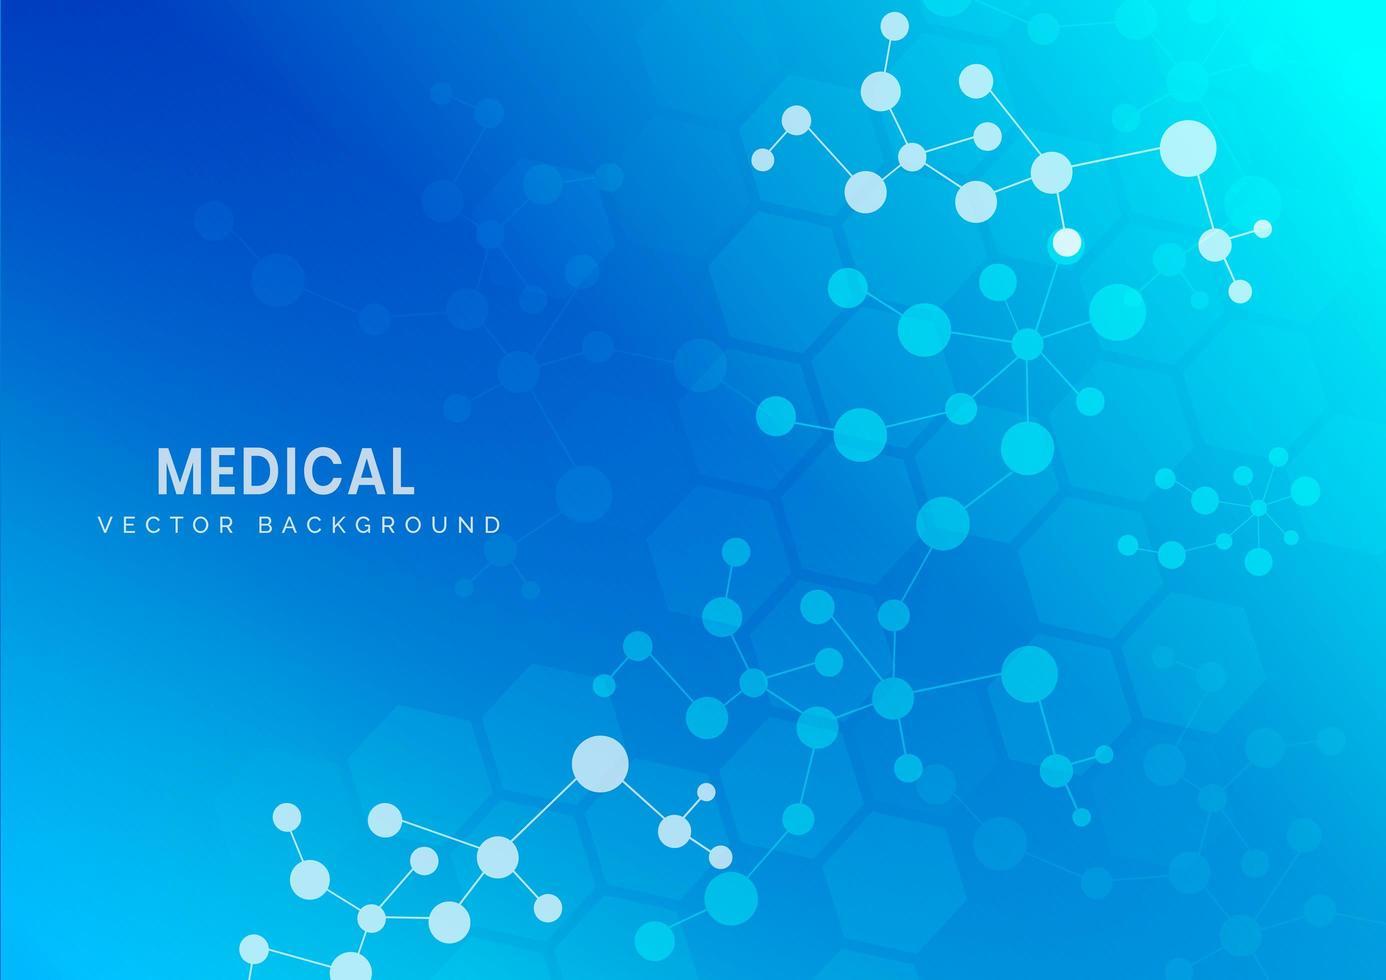 estrutura molecular médica e científica sobre fundo azul vetor